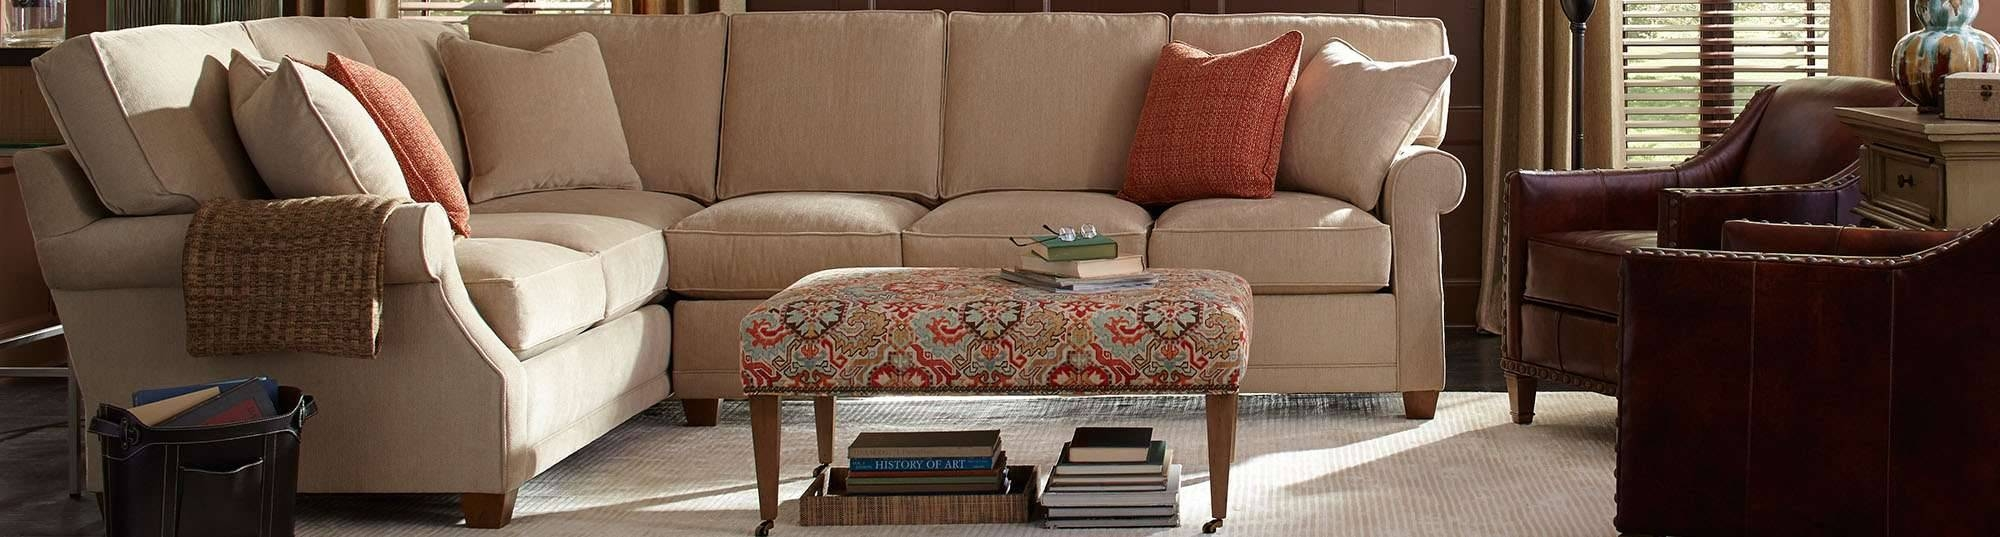 Lofty Ideas Rowe Furniture Sofa Innovative Barnett | Furniture with Rowe Sectional Sofas (Image 4 of 15)